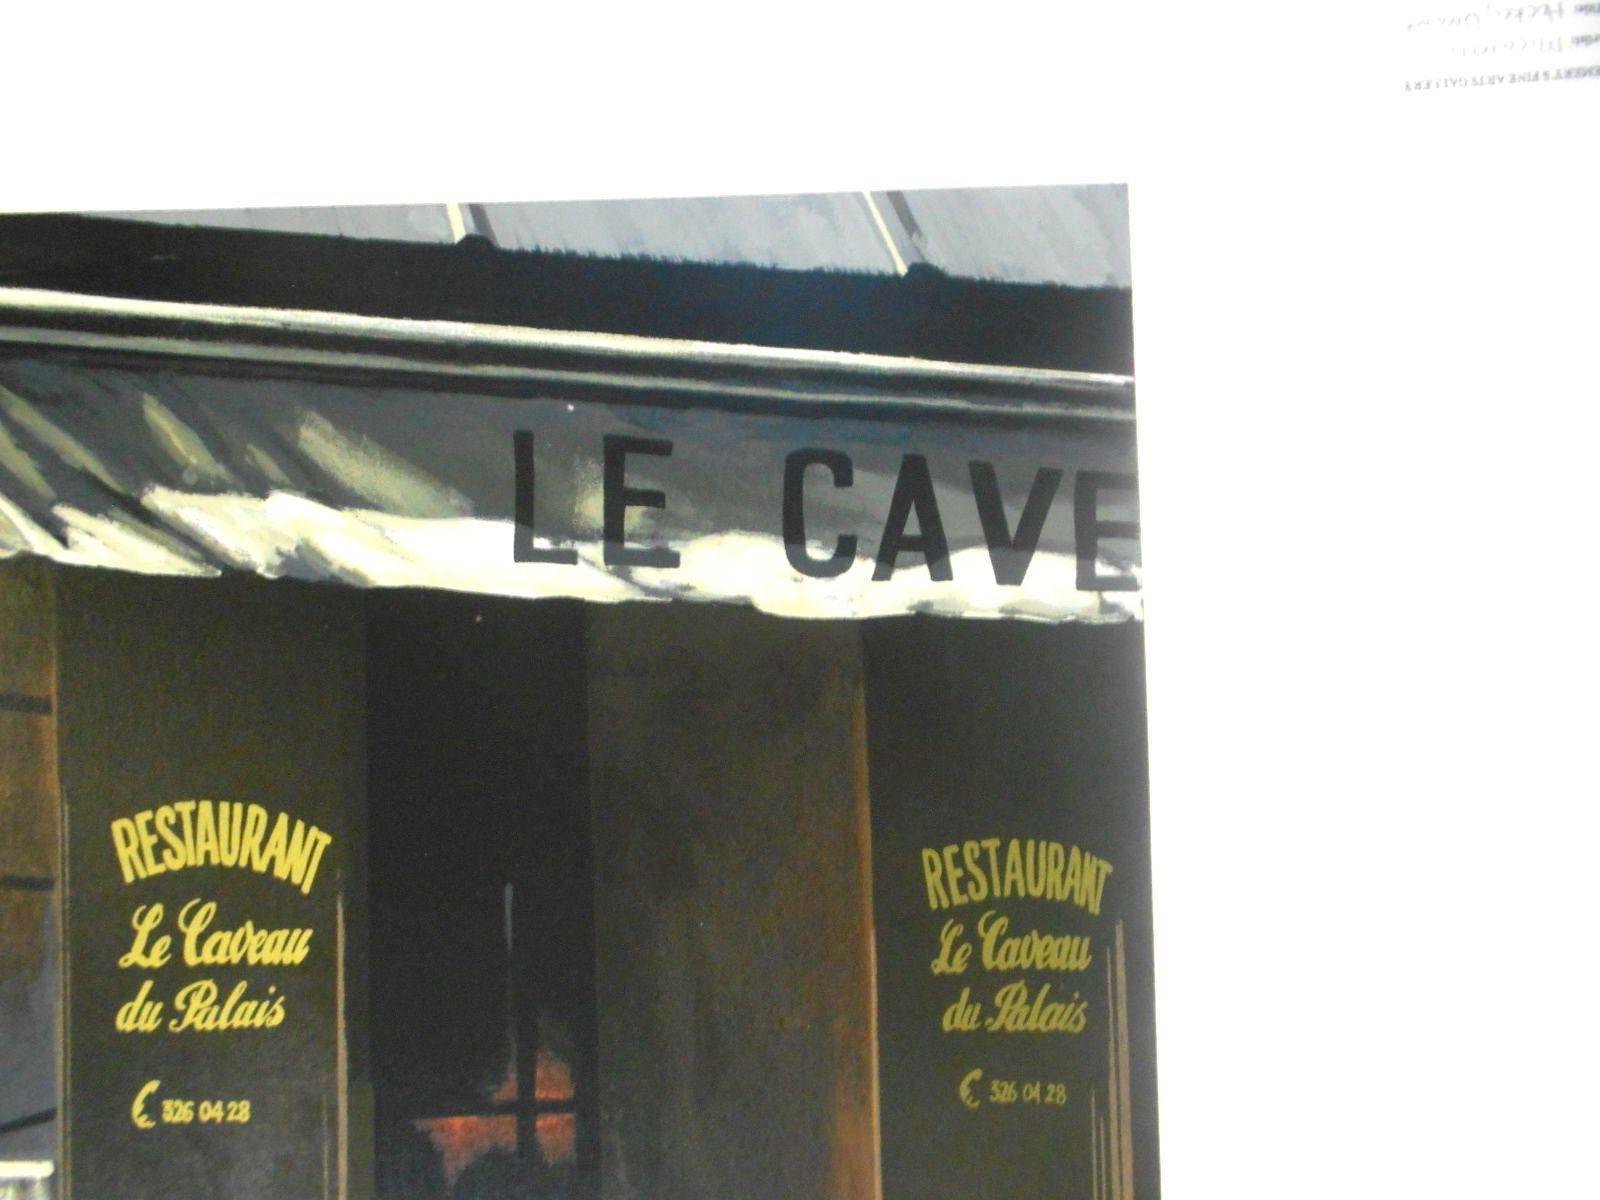 Le Caveau De Palais by Thomas Pradzynski; Rare signed